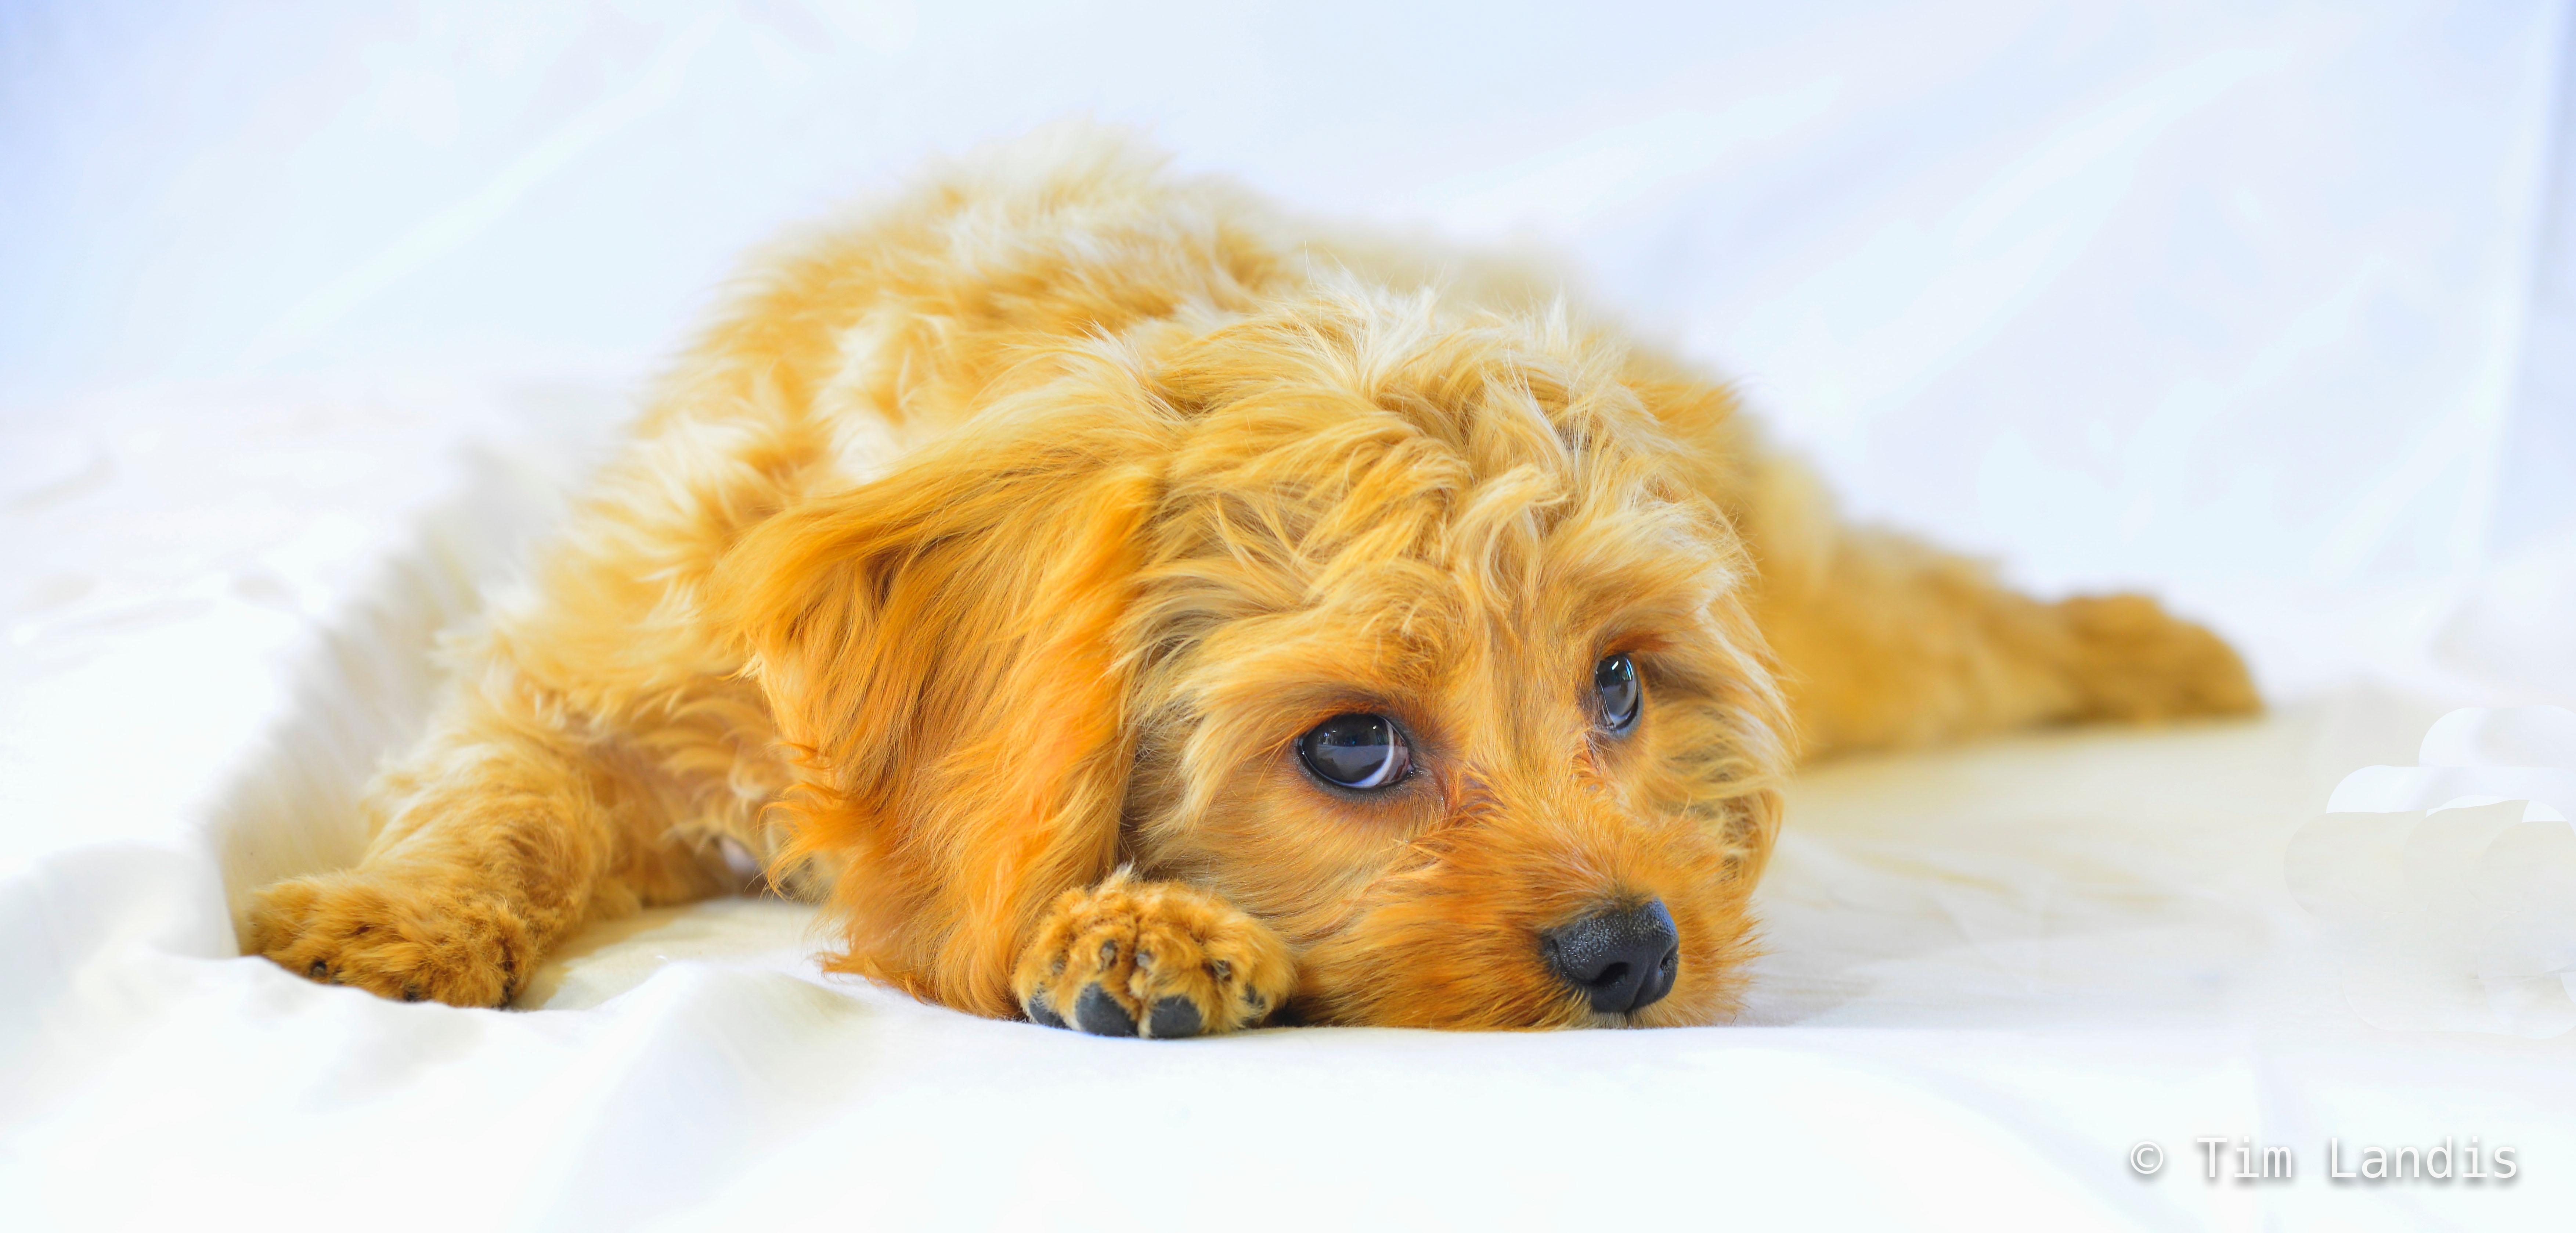 Romeo, cavapoochon, cuddly, eyes, fuzzy, love, nap, puppy, sleepy, warm, photo